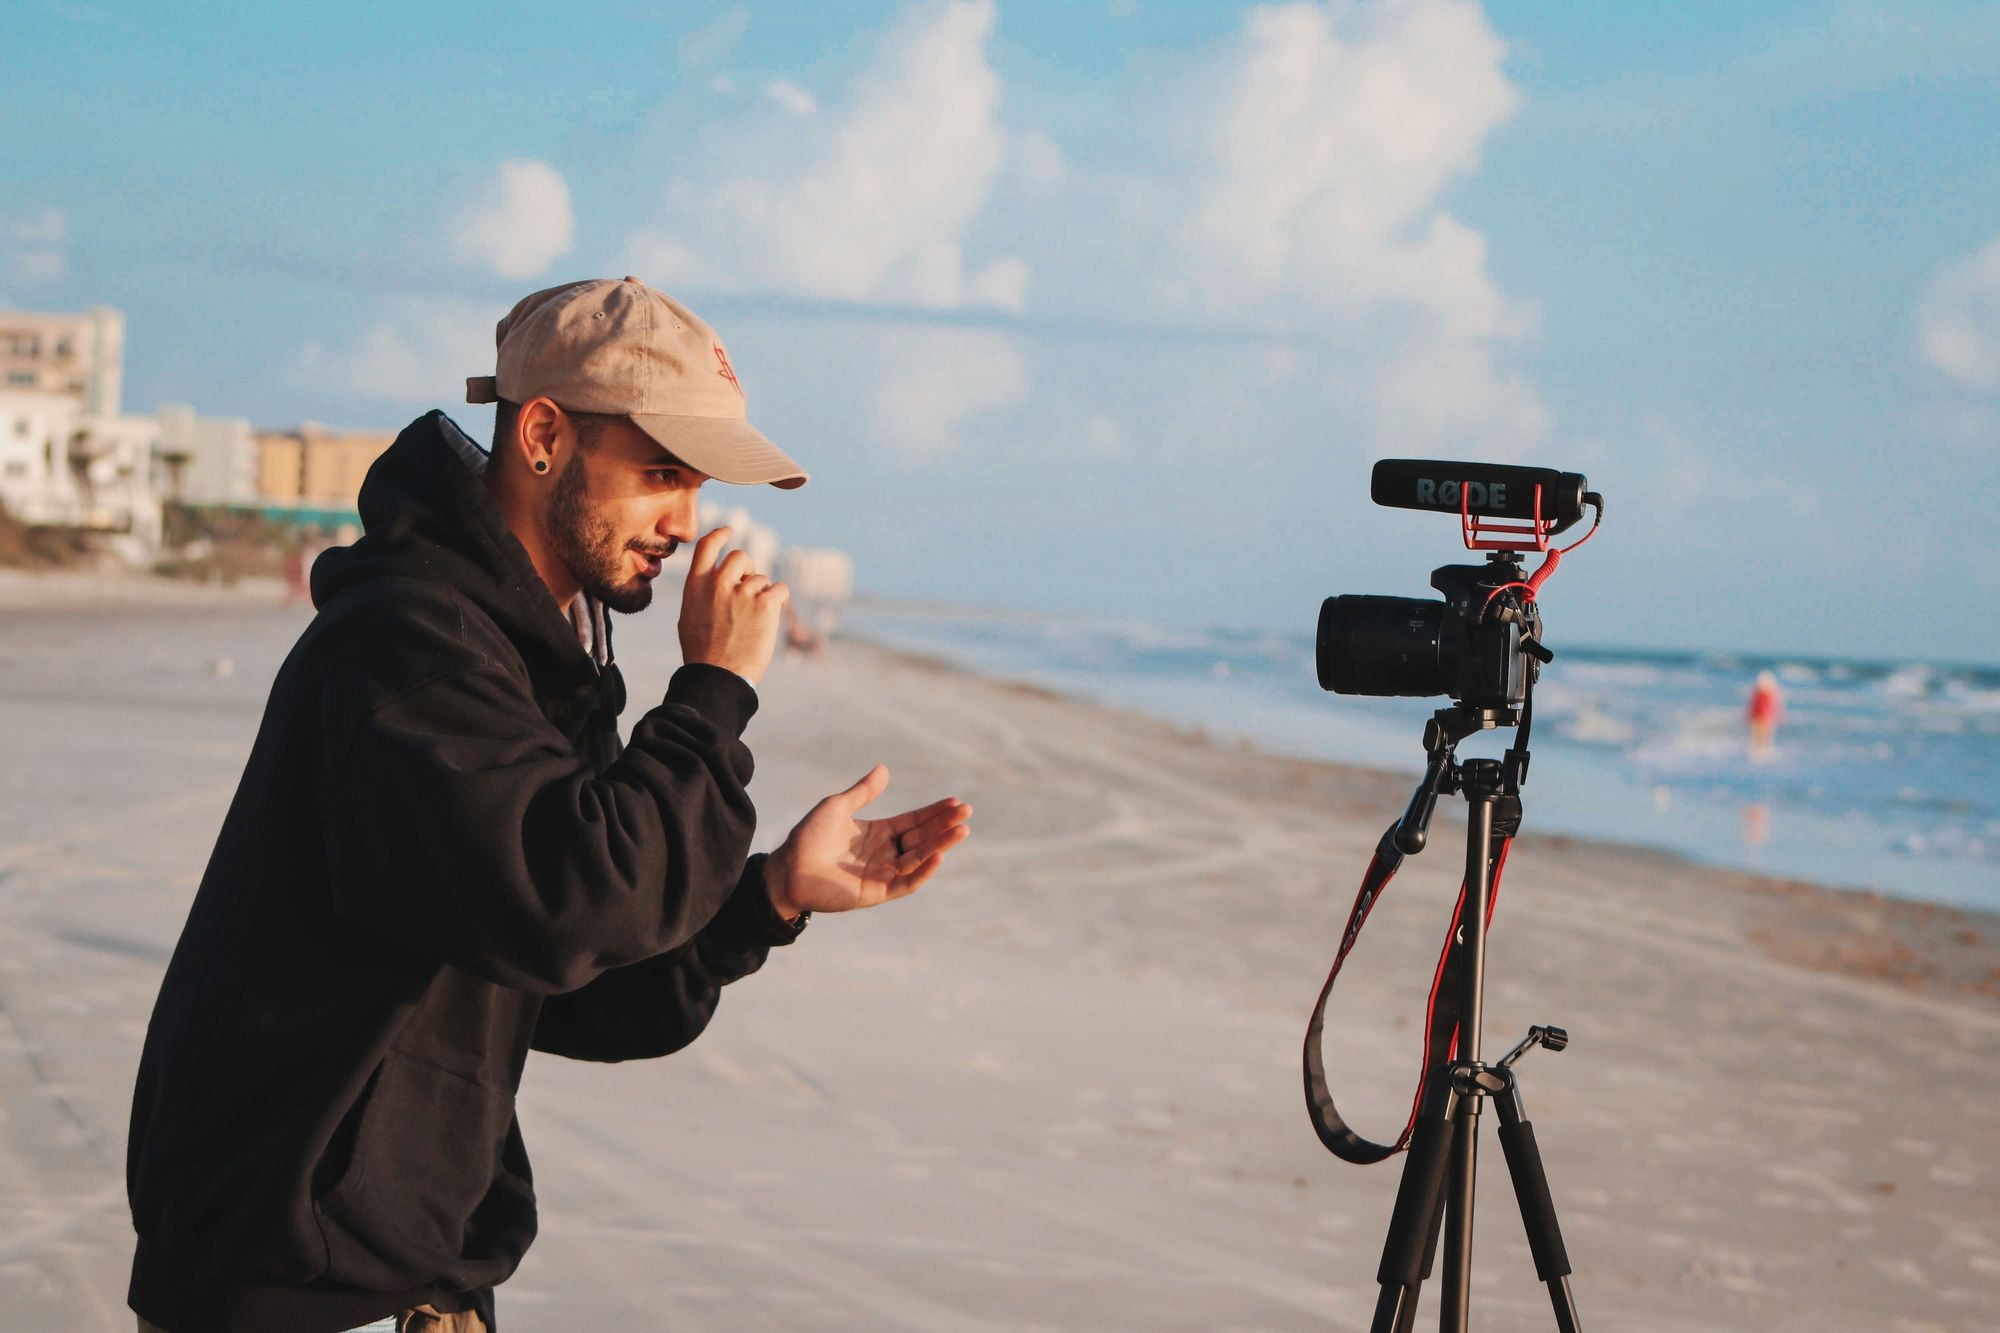 man-recording-himself